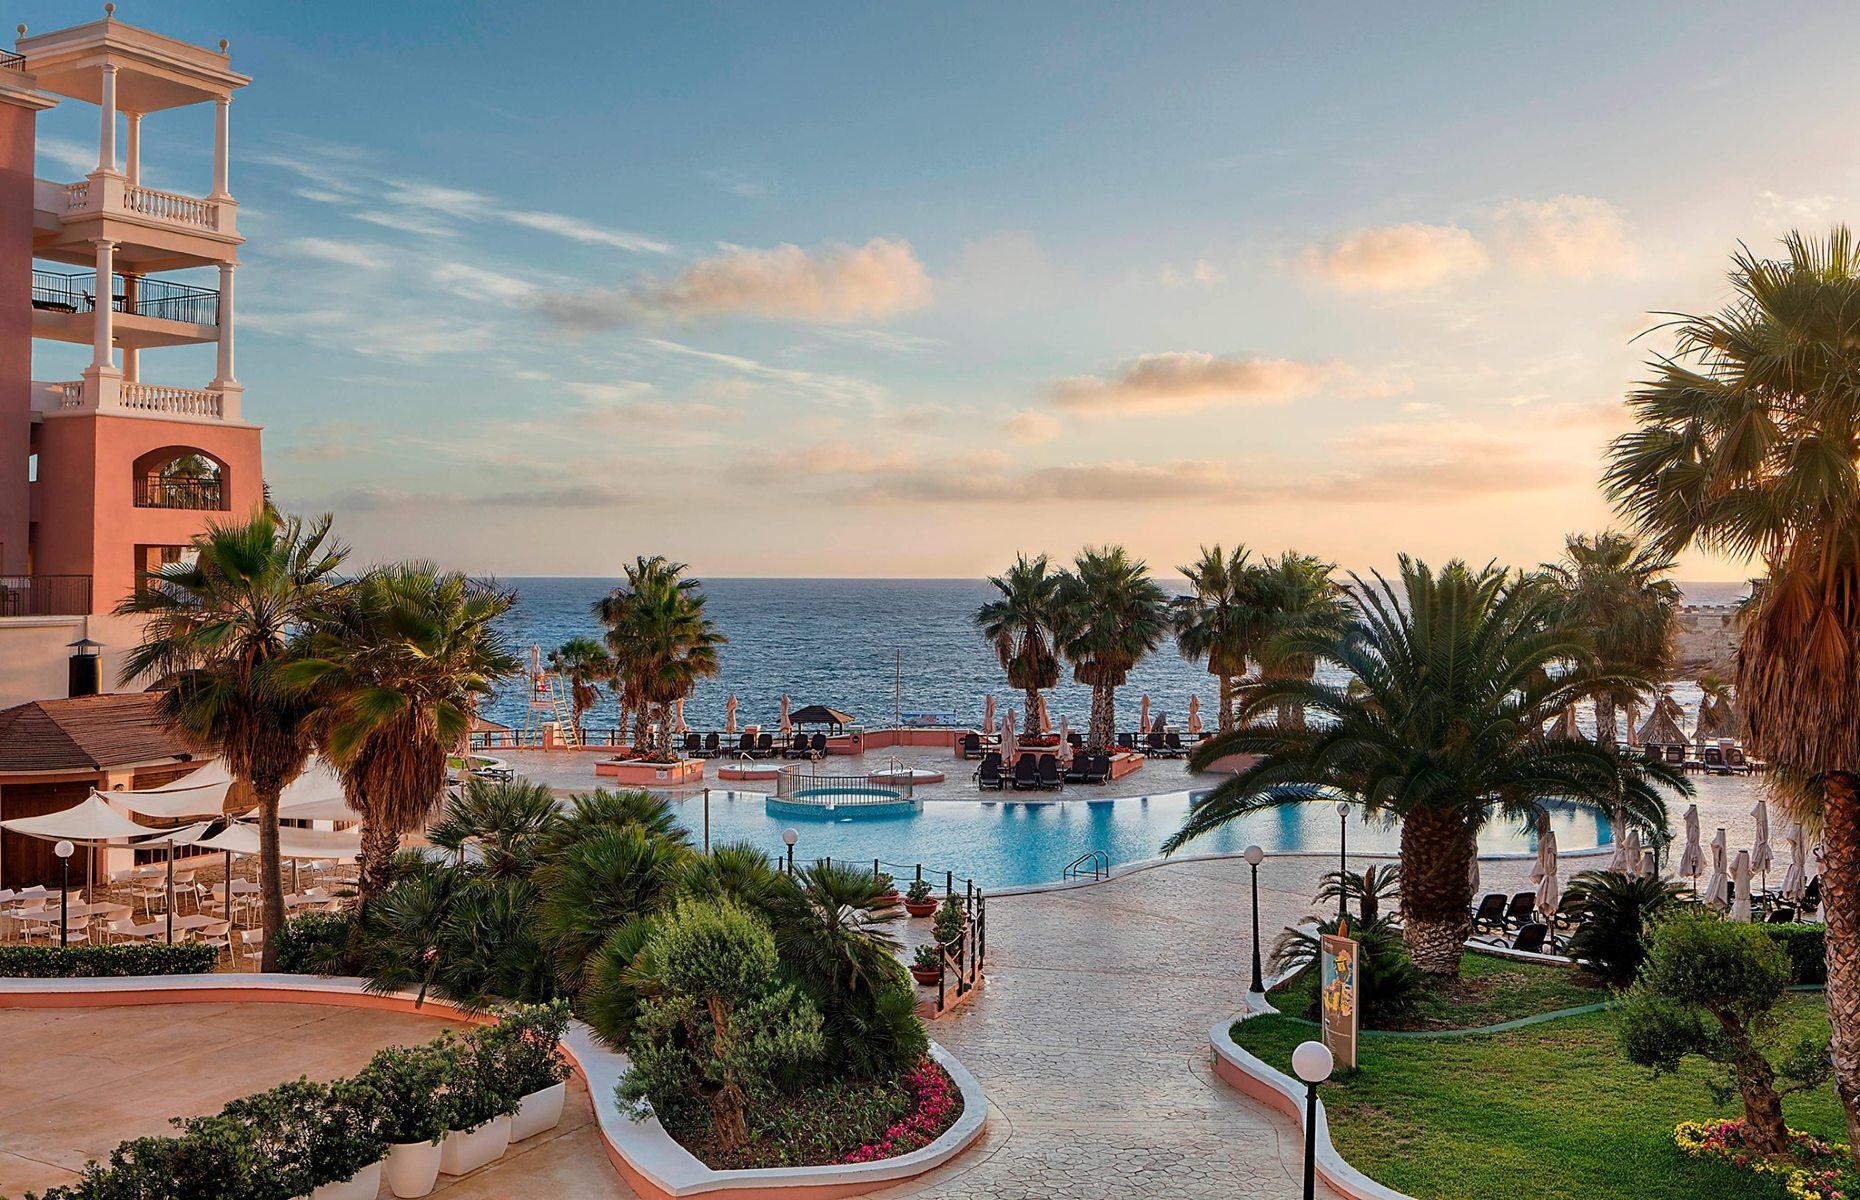 Westin Dragonara Resort (Image: The Westin Dragonara Resort, Malta/Facebook)